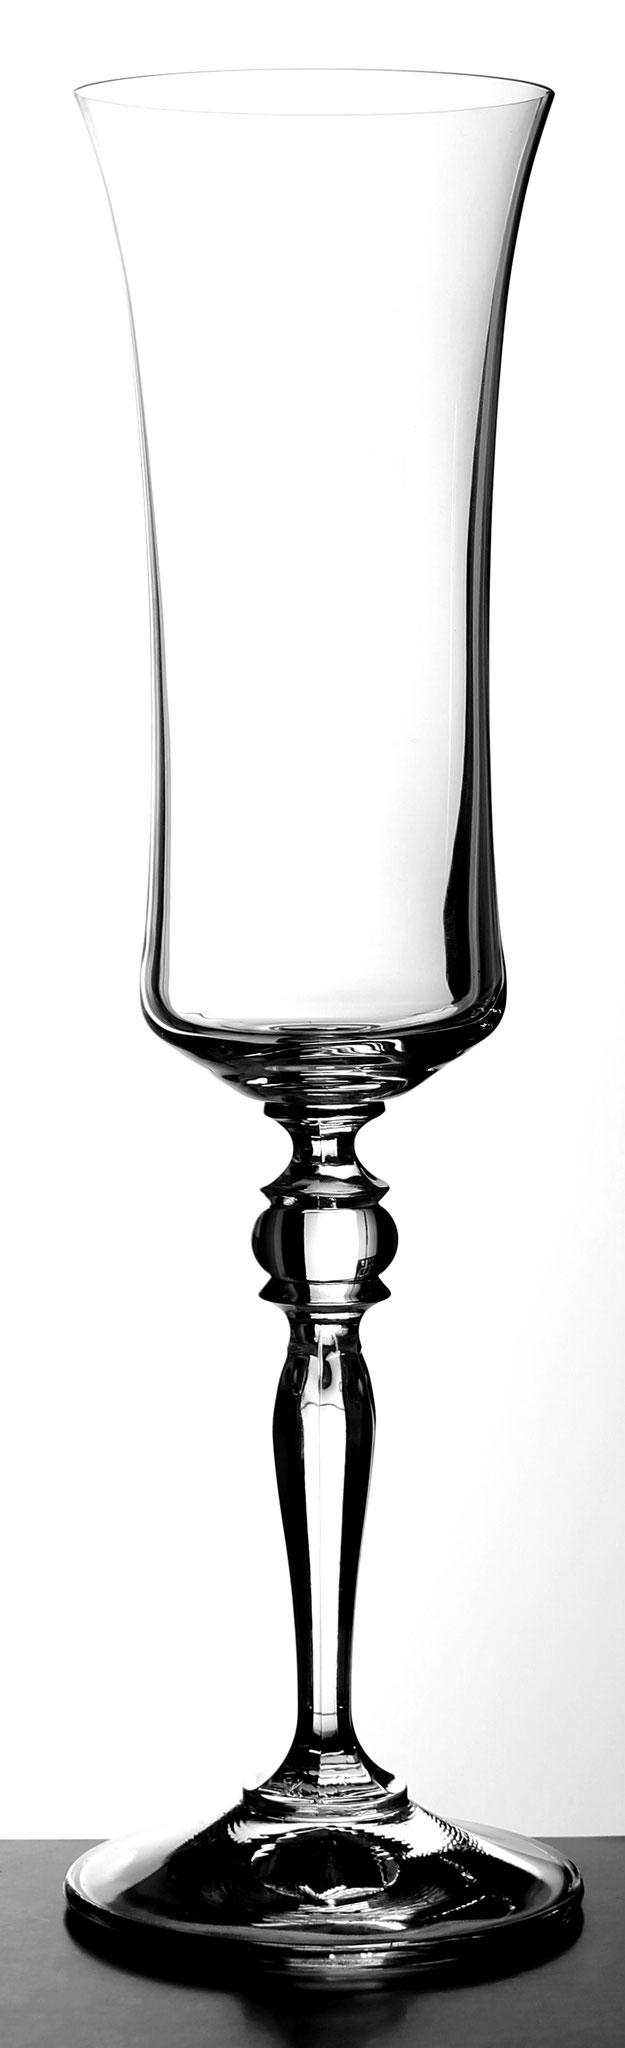 Chapeau Sektglas 250 ml